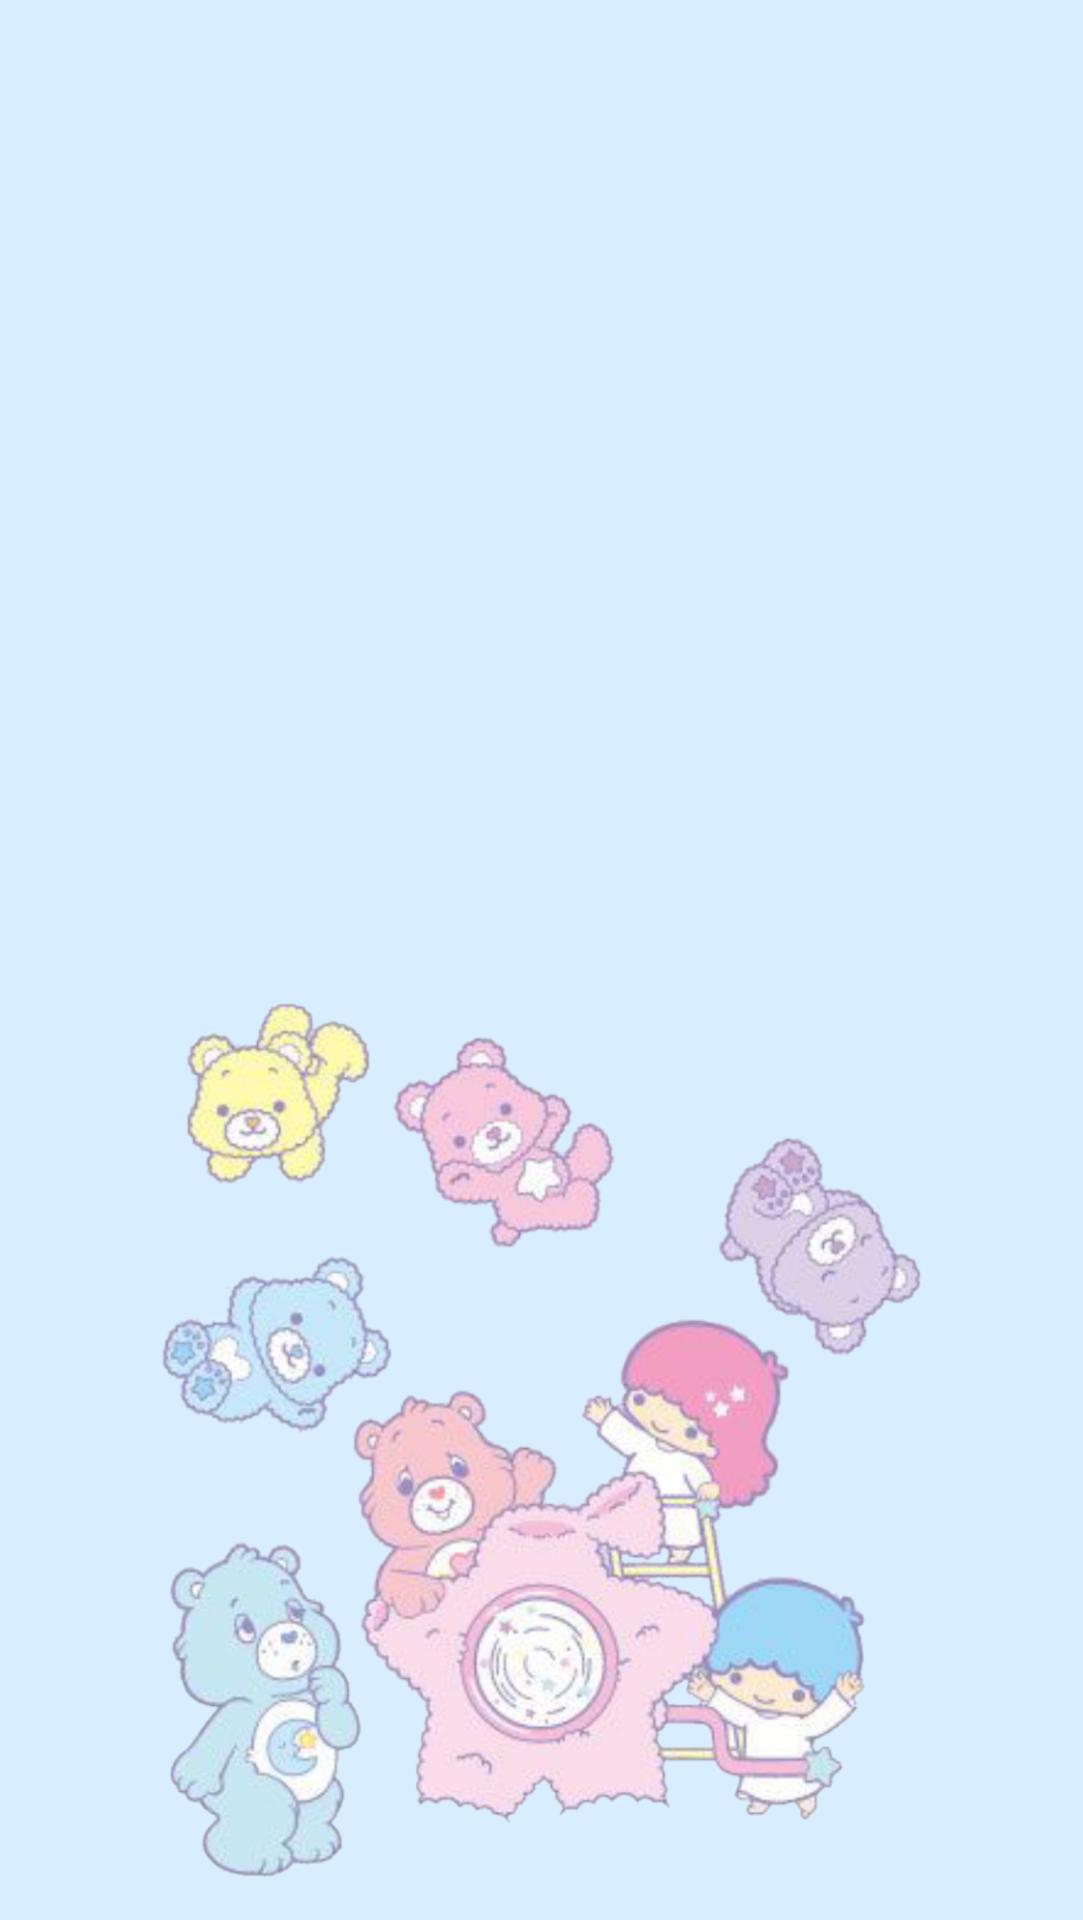 Care Bears Aesthetic Iphone Wallpaper Bear Wallpaper Cute Wallpapers